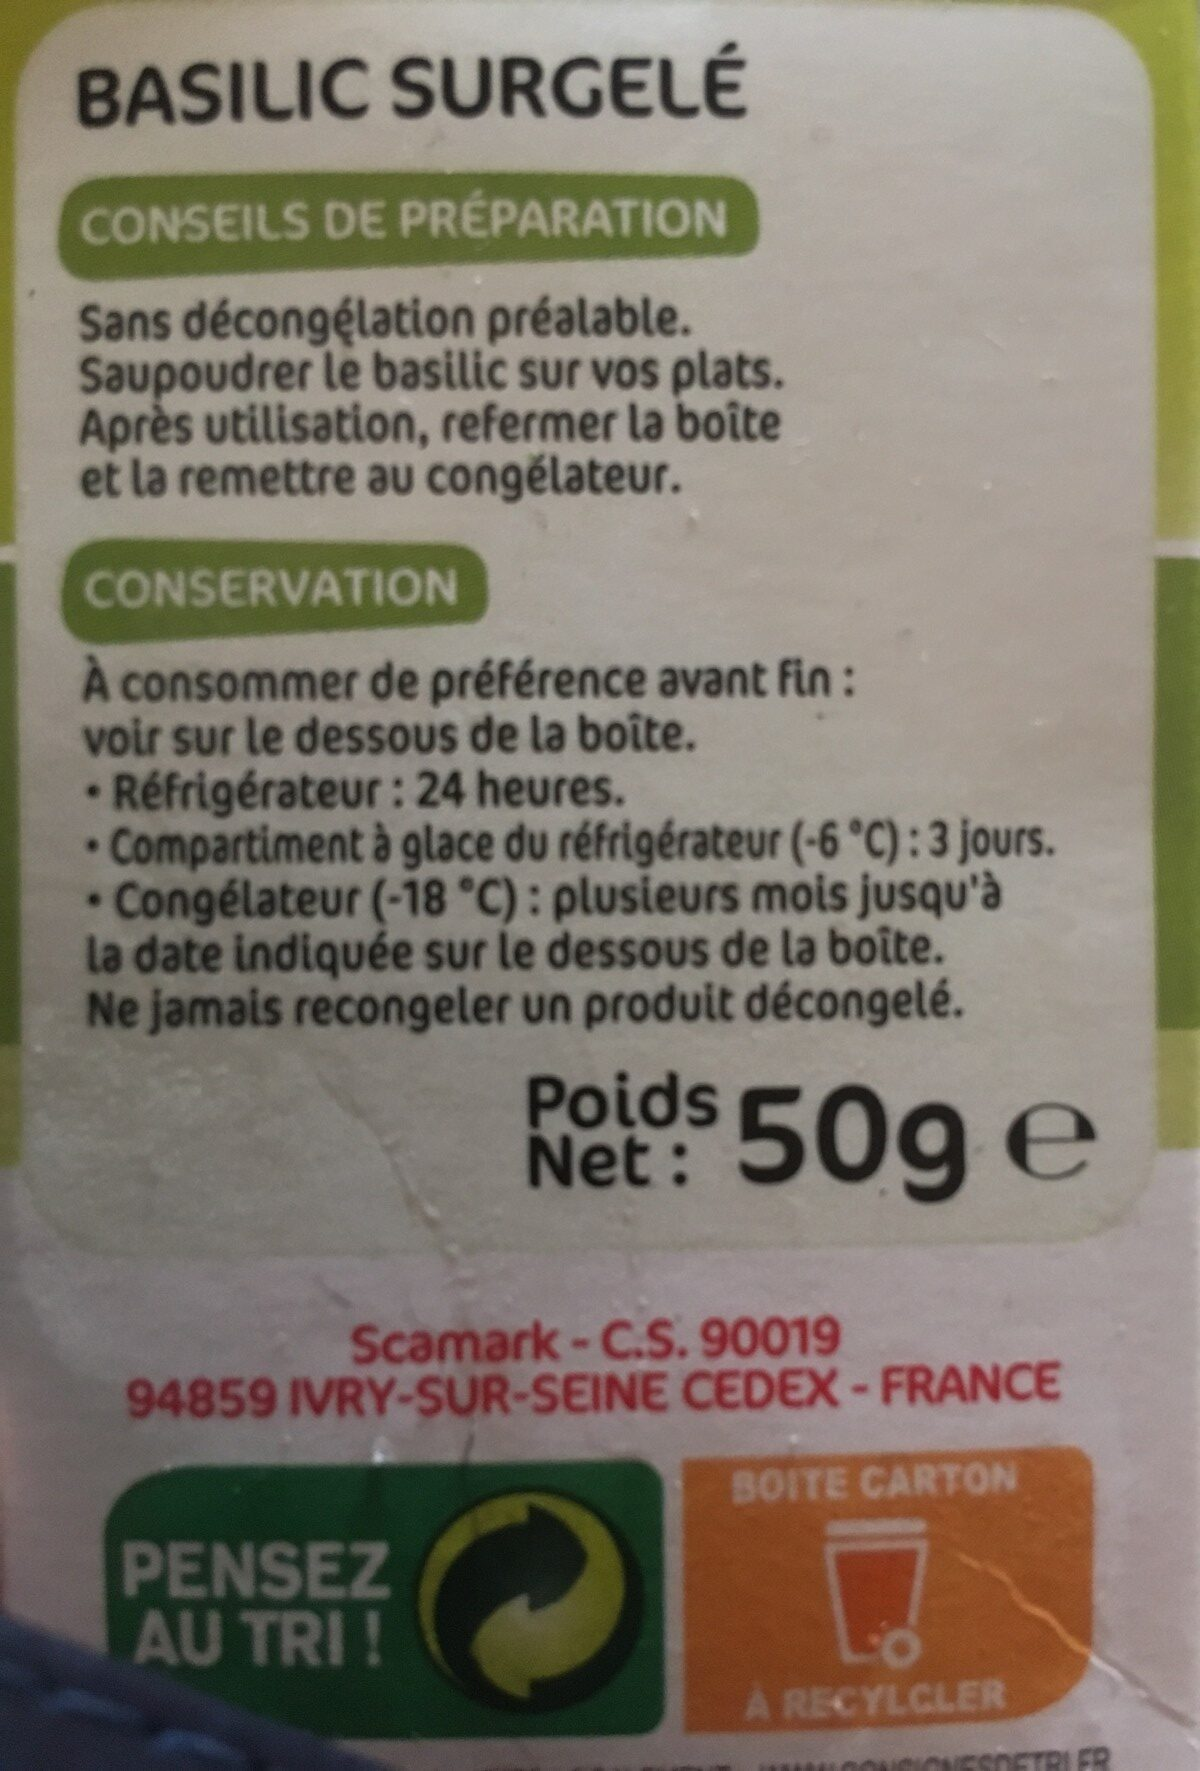 Basilic surgelé - Ingrediënten - fr